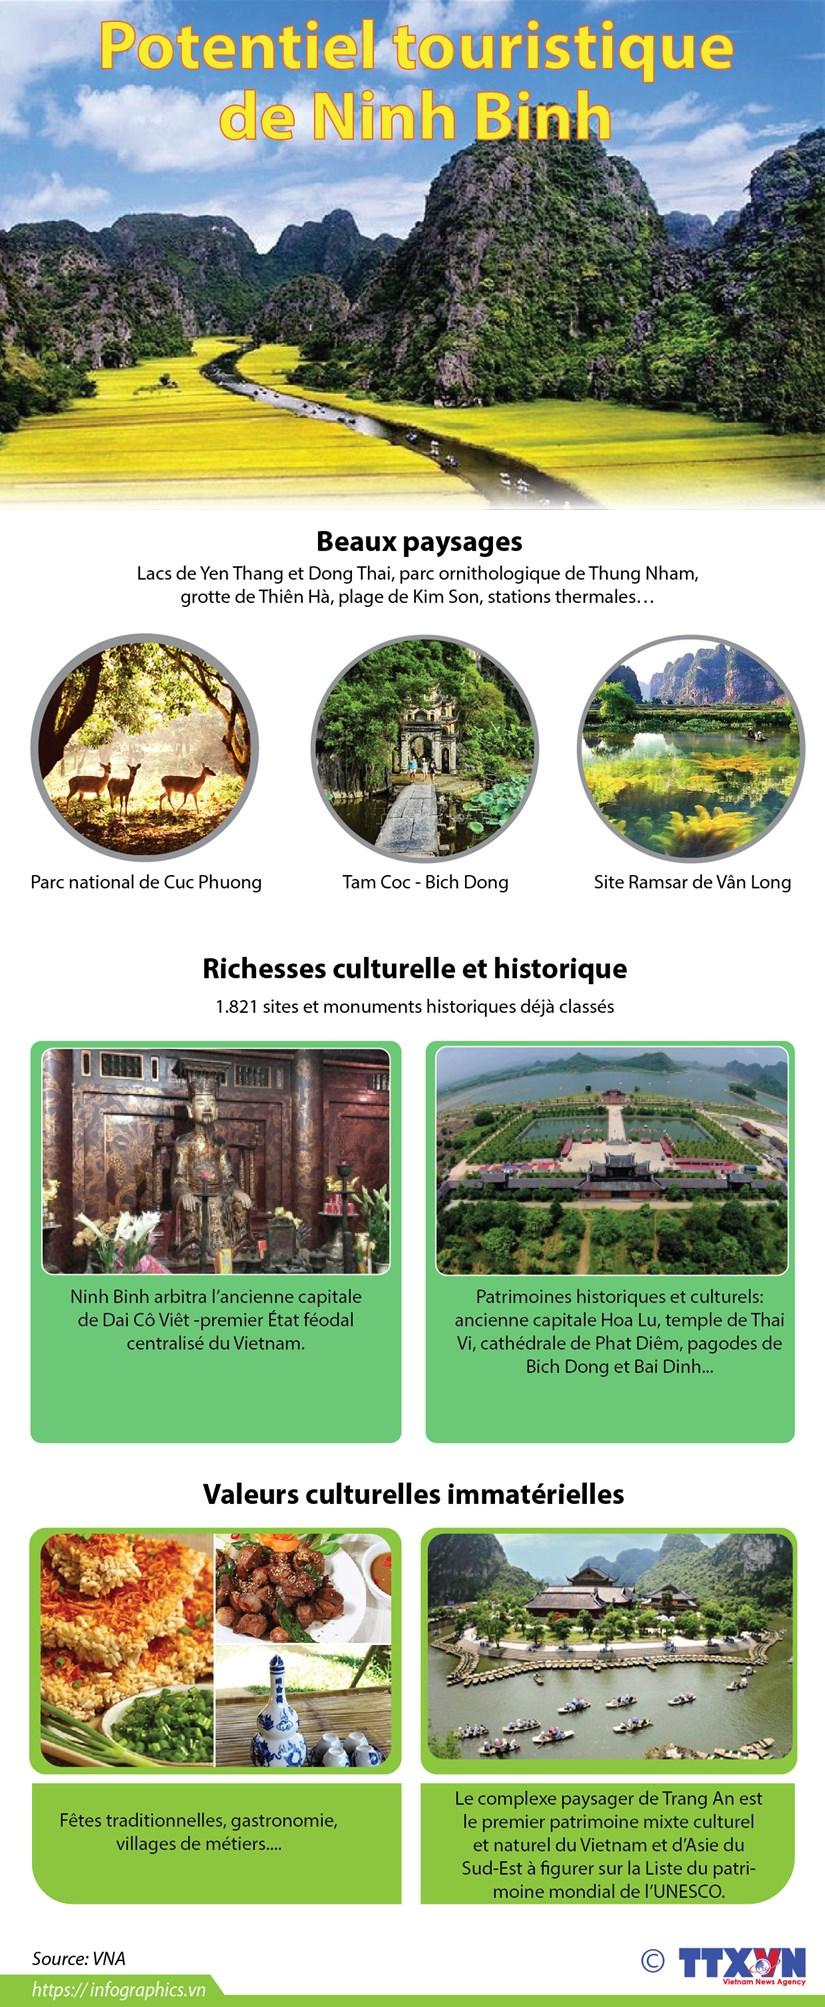 Potentiel touristique de Ninh Binh hinh anh 1